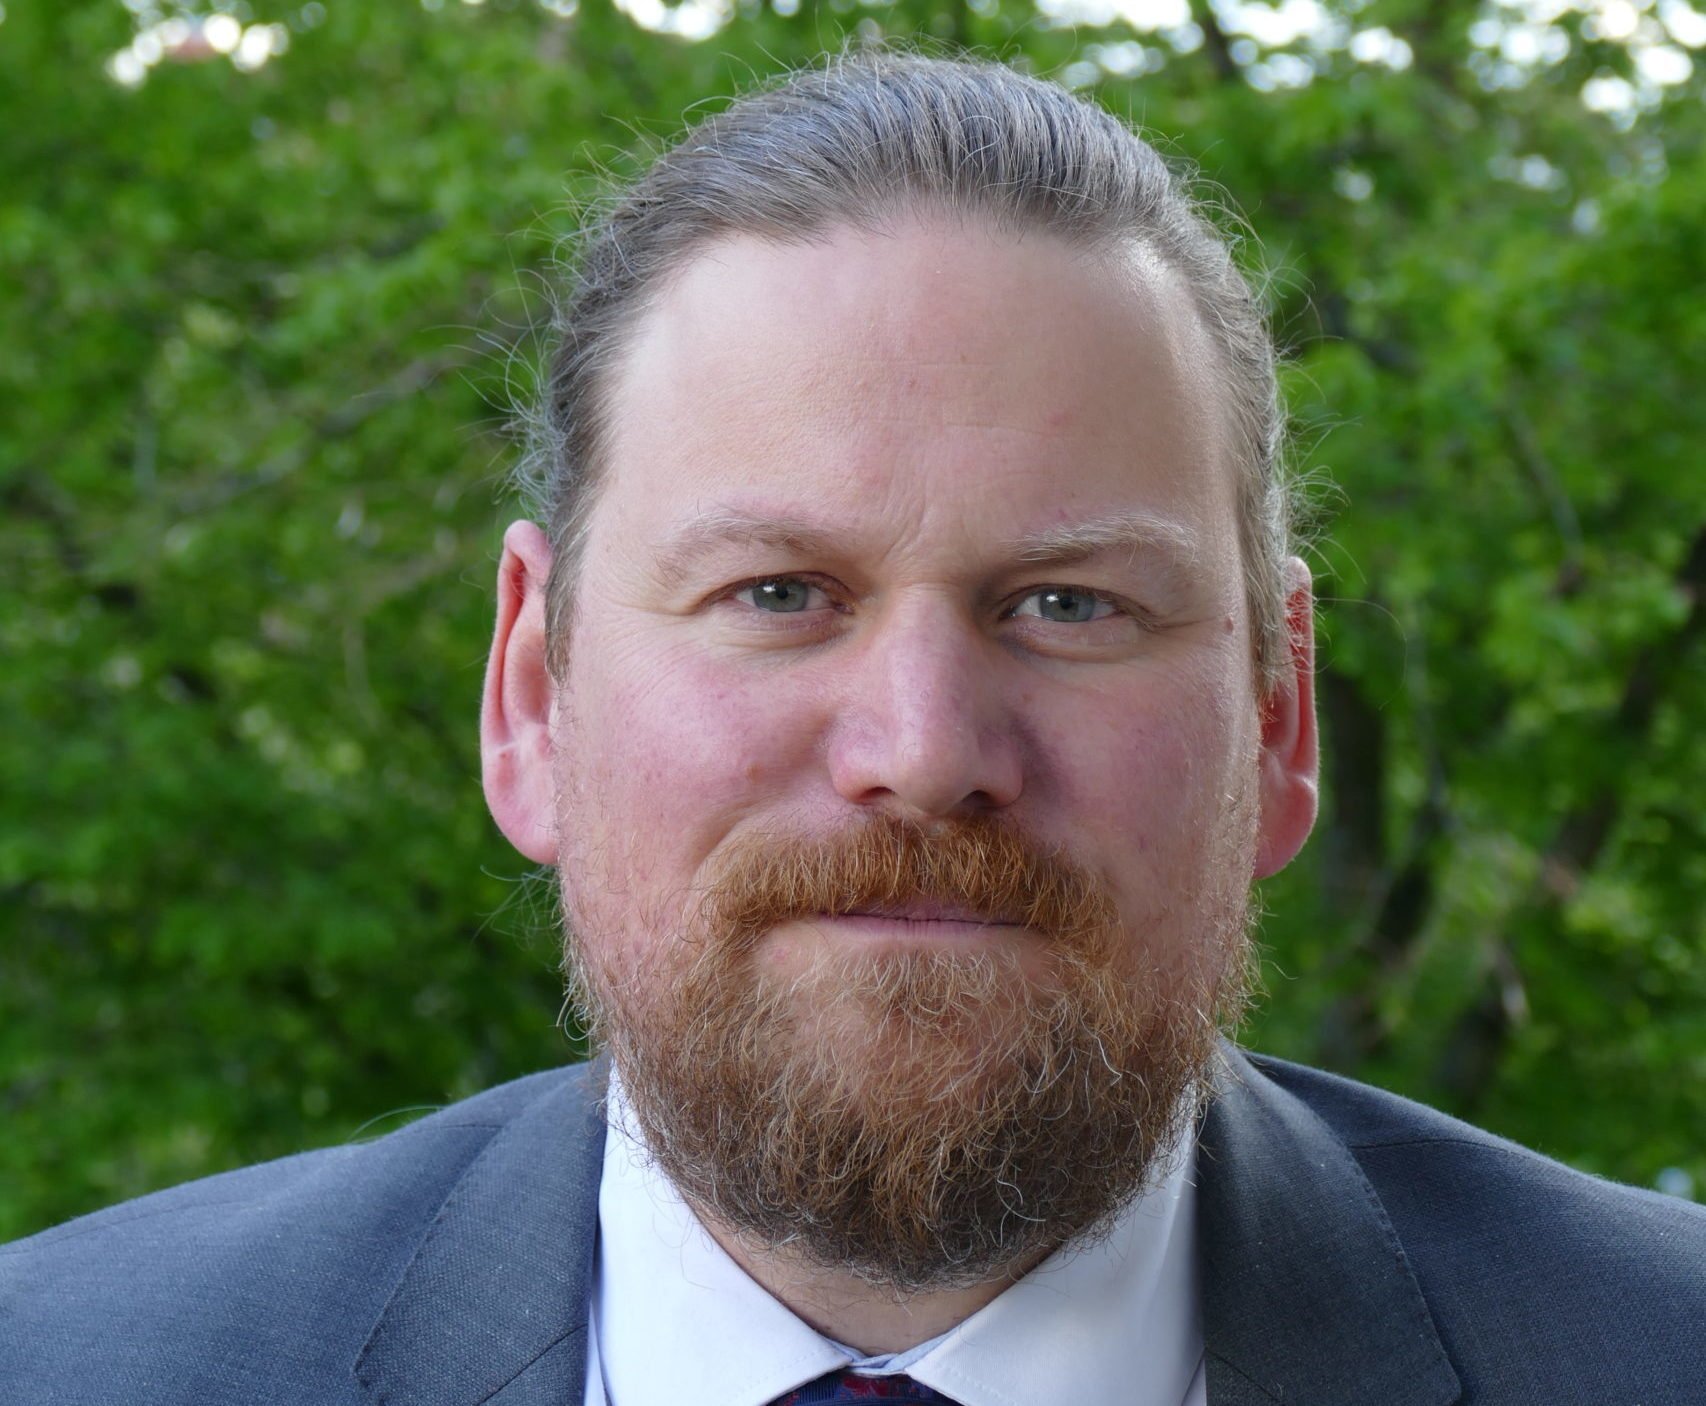 Ingmar Juergens